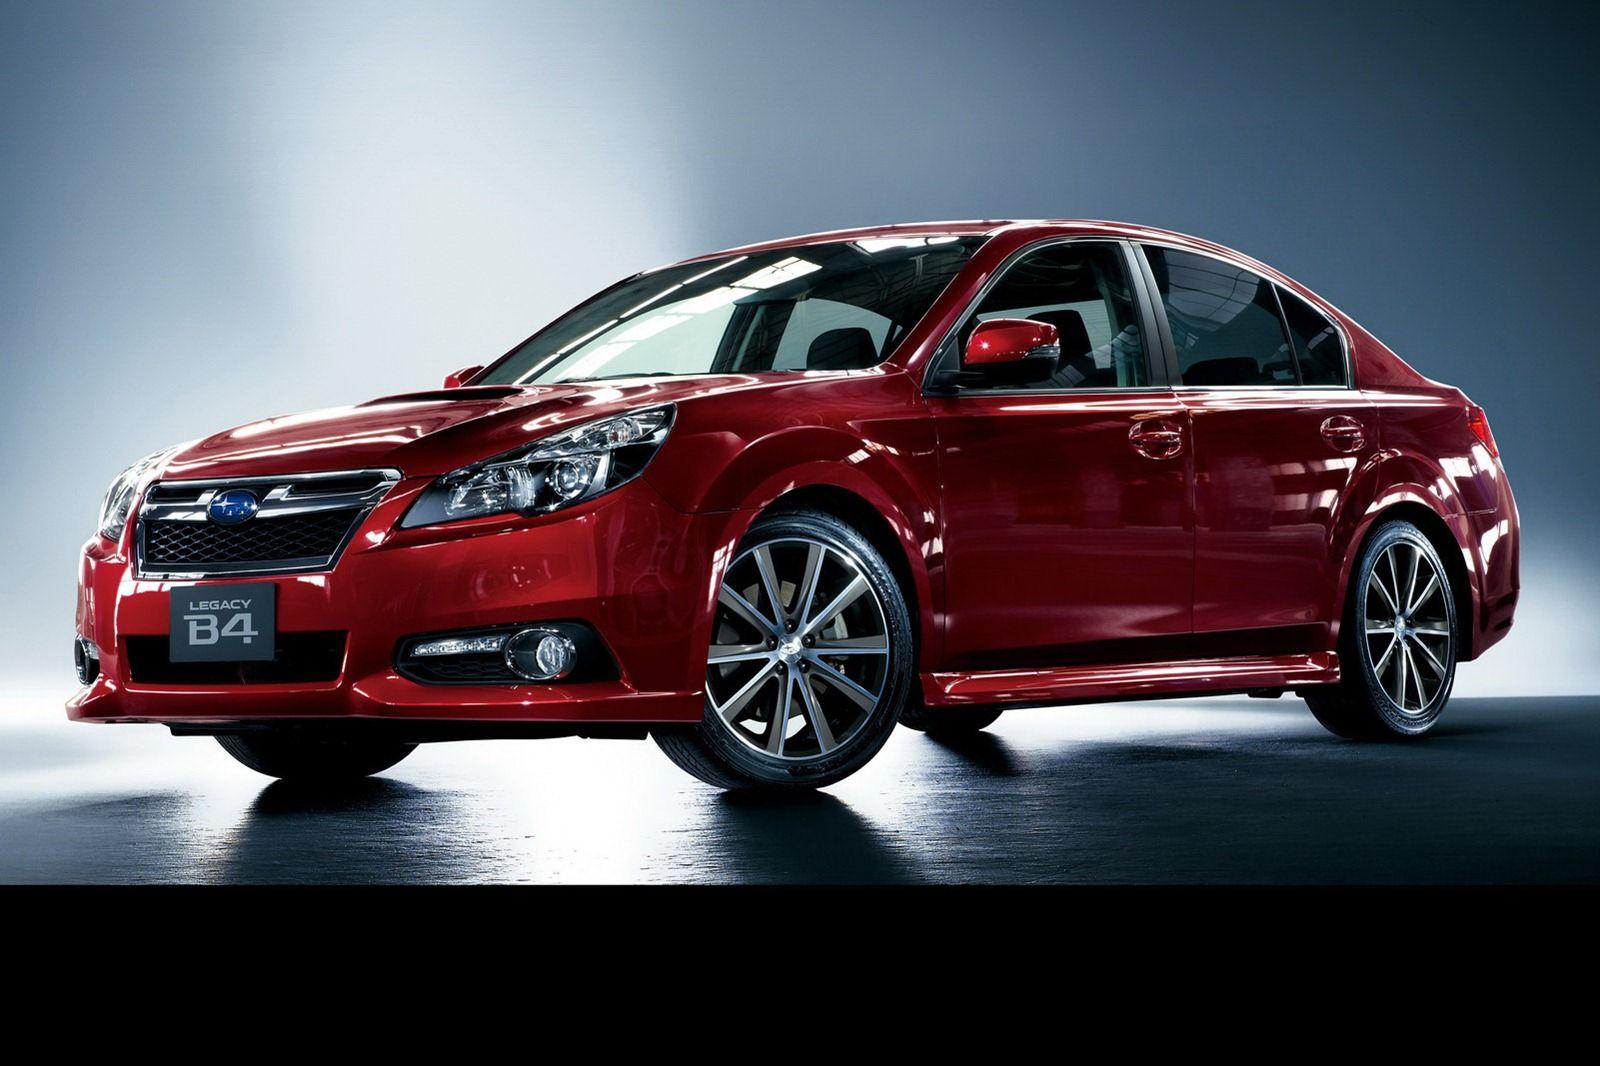 Subaru legacy b4 i will drive this car tint those windows up a subaru legacy b4 i will drive this car tint those windows up a bit vanachro Gallery